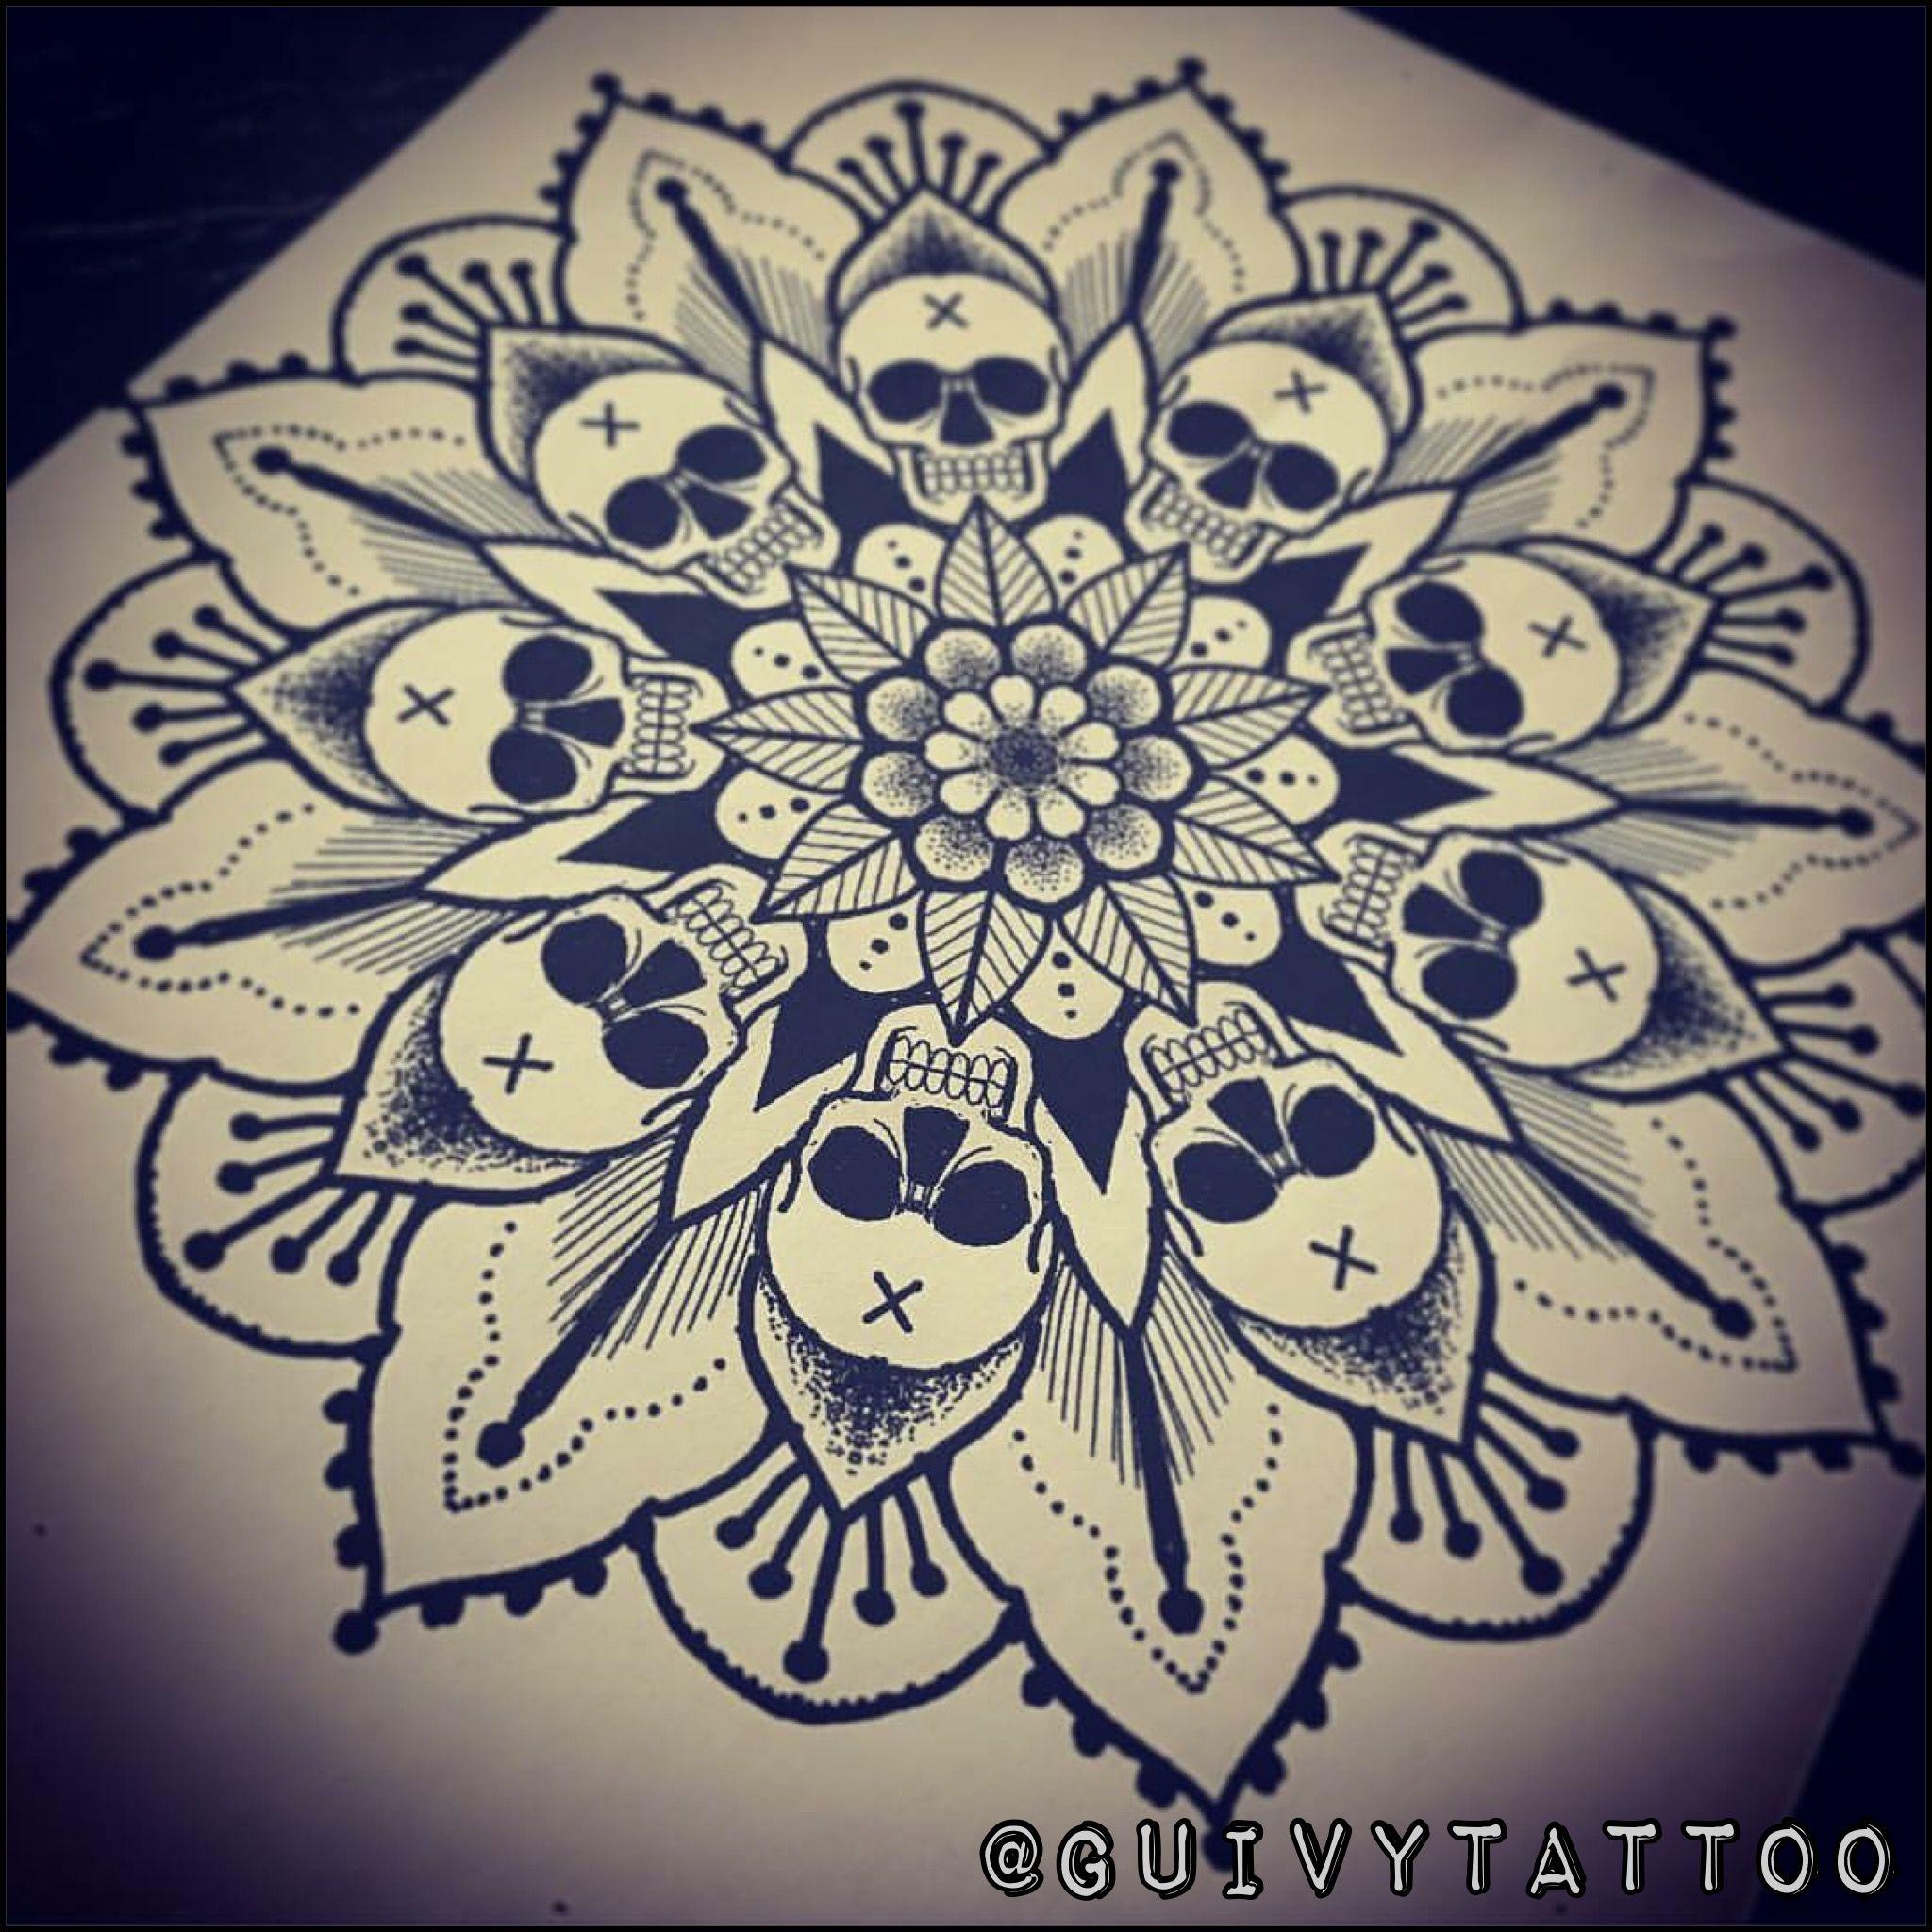 guivy tattoo geneva mandala skull tattoo tatouage. Black Bedroom Furniture Sets. Home Design Ideas